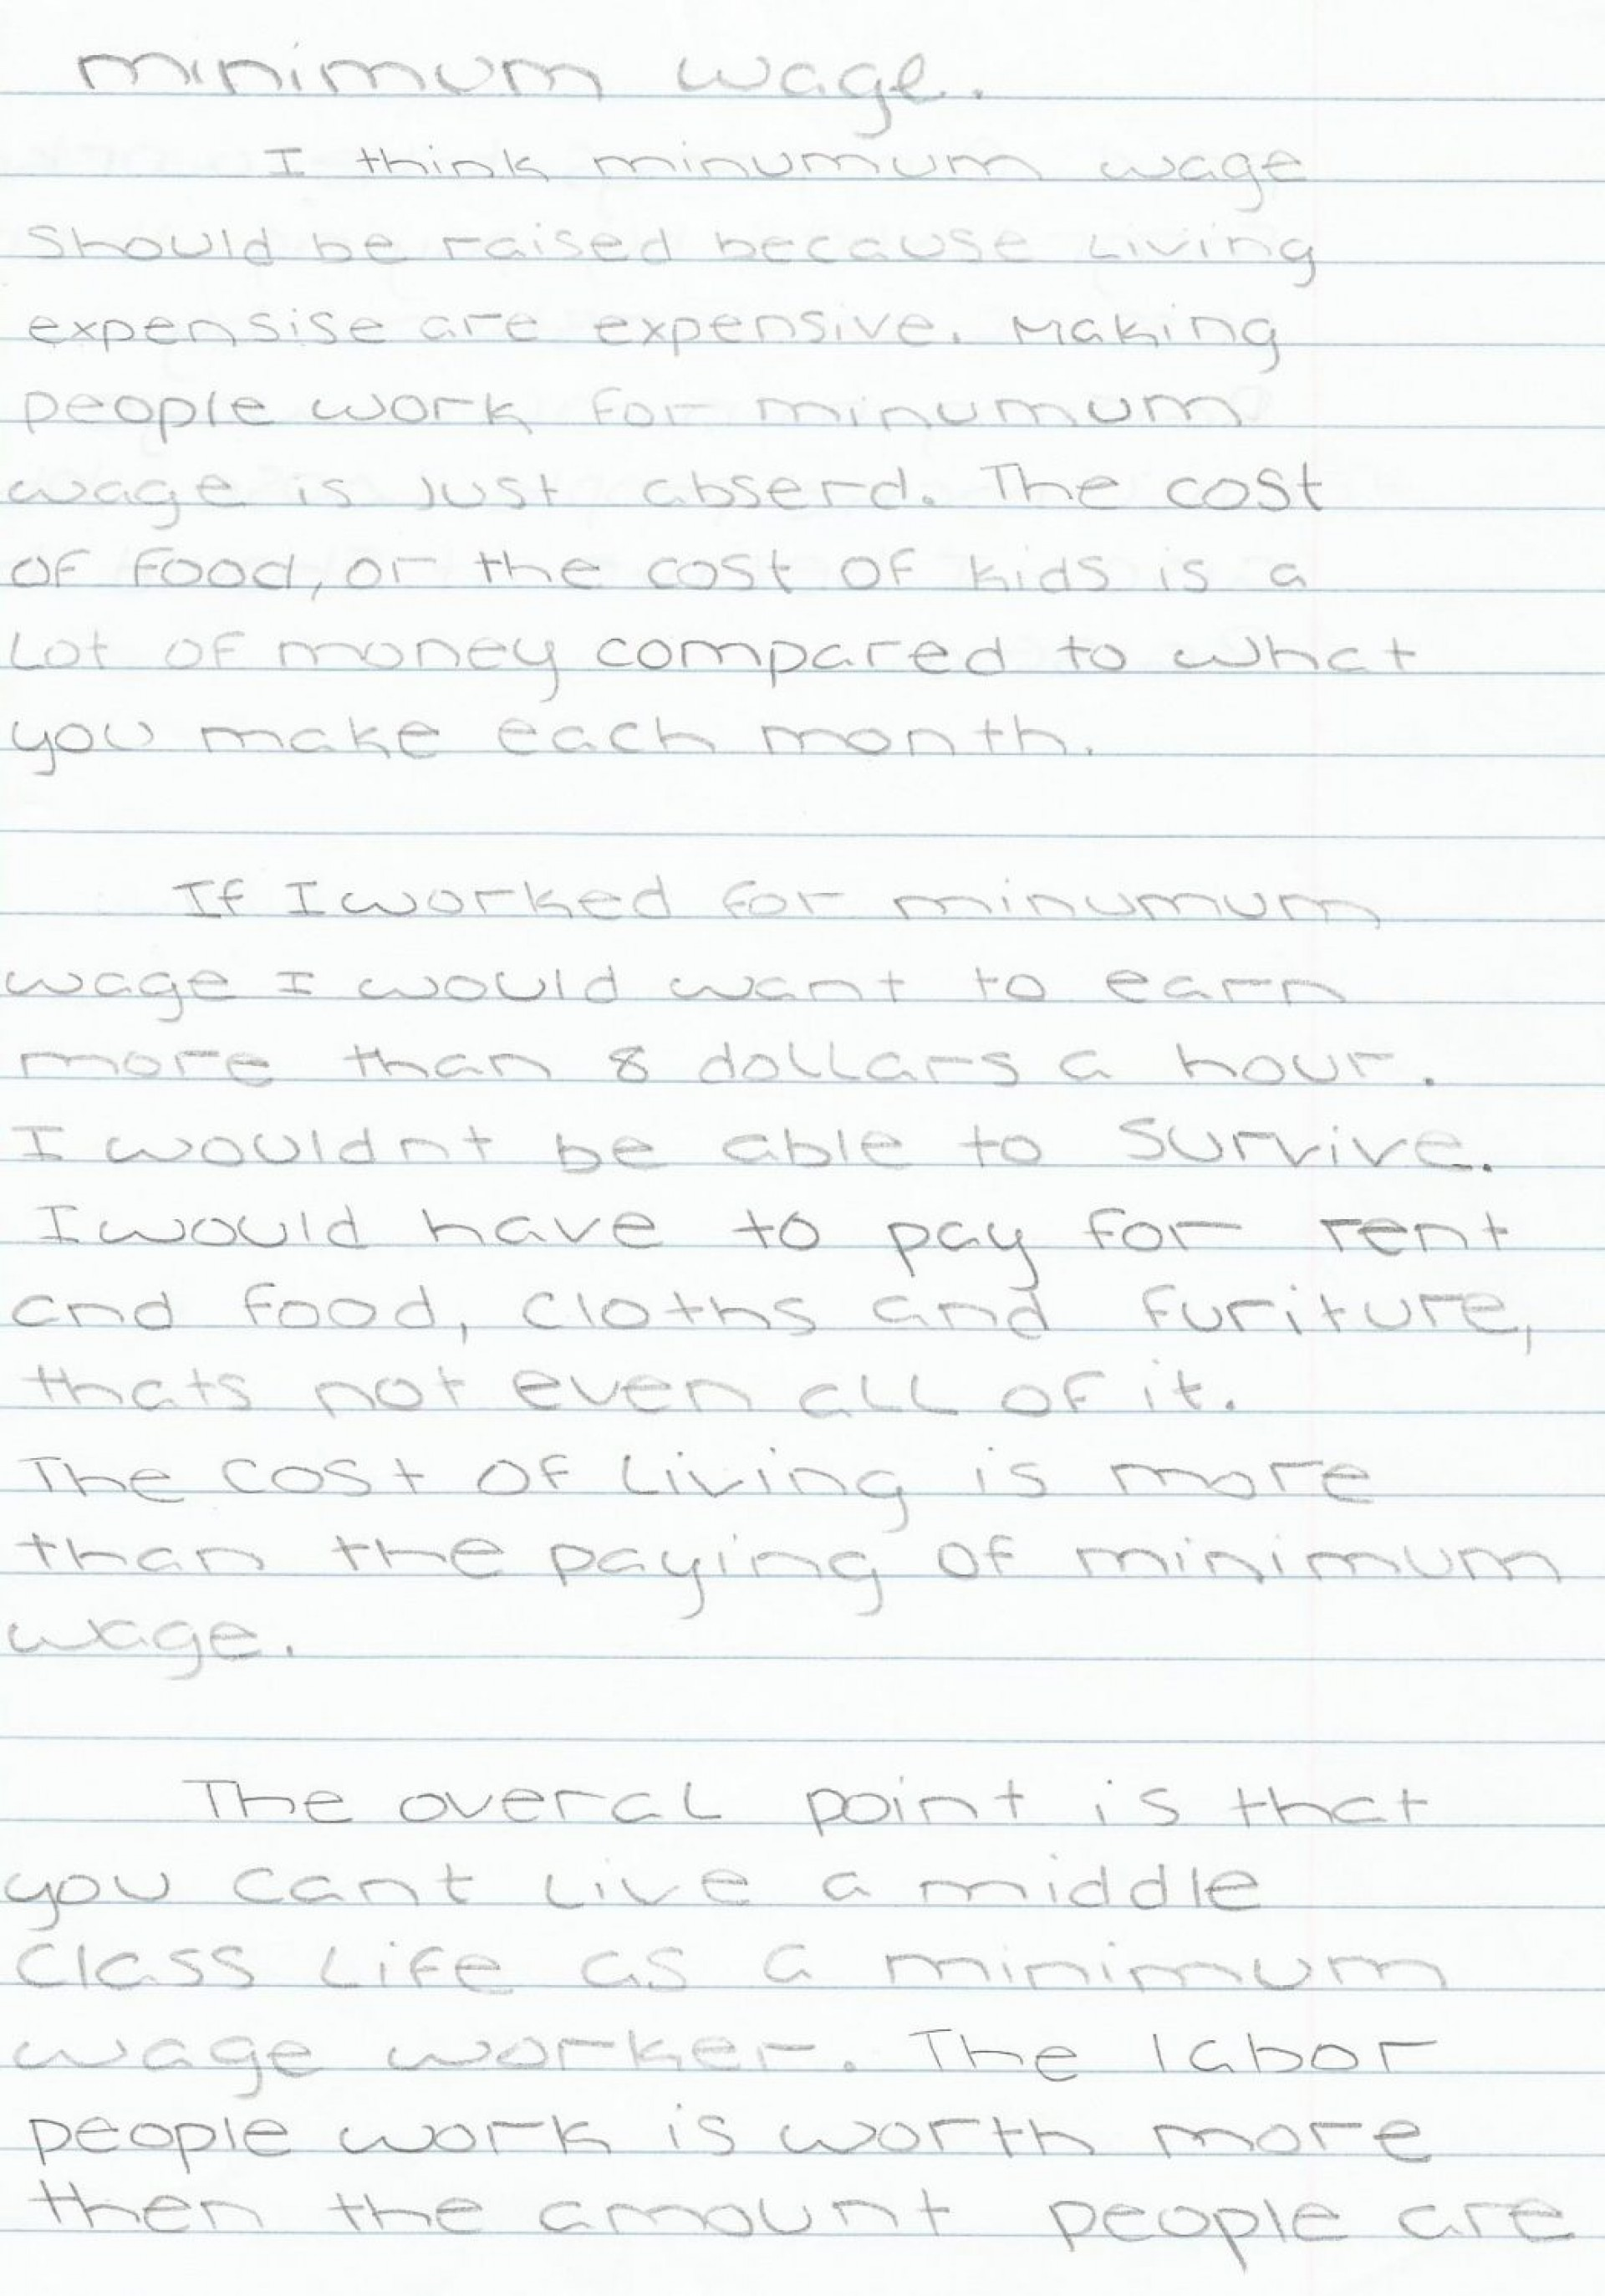 002 Essay Example On Minimum Wage Should Raised Write Schola Increase Argumentative Raising Beautiful Persuasive Free 1920